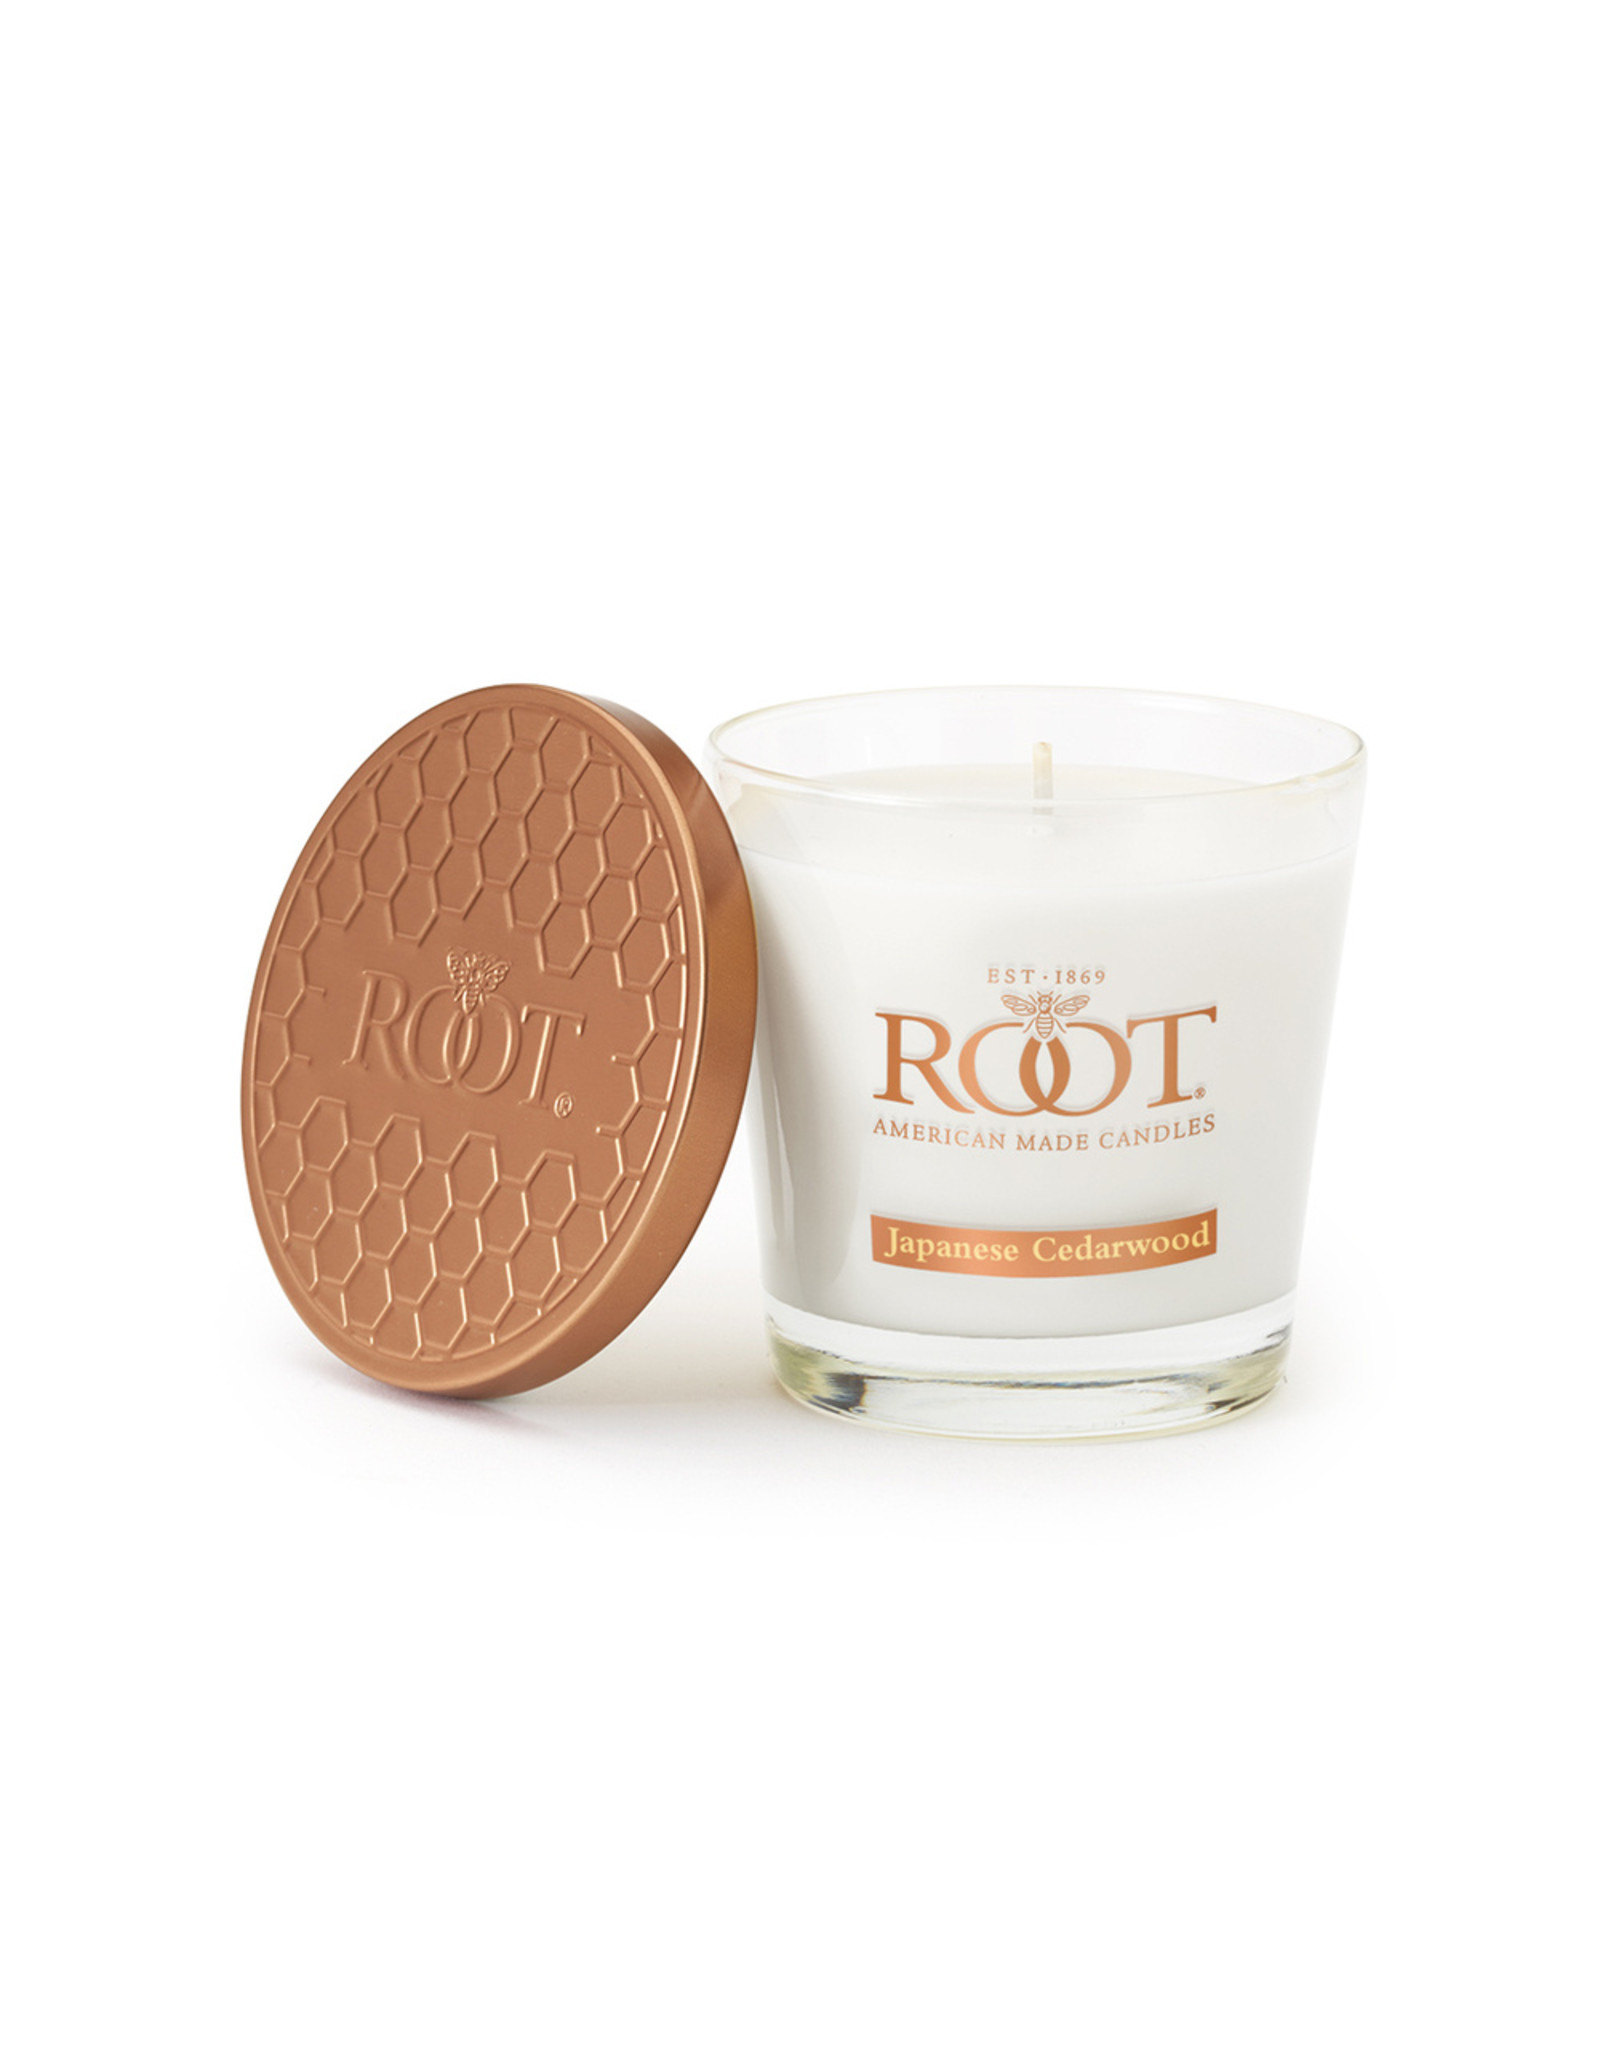 Root Candle - Japanese Cedarwood